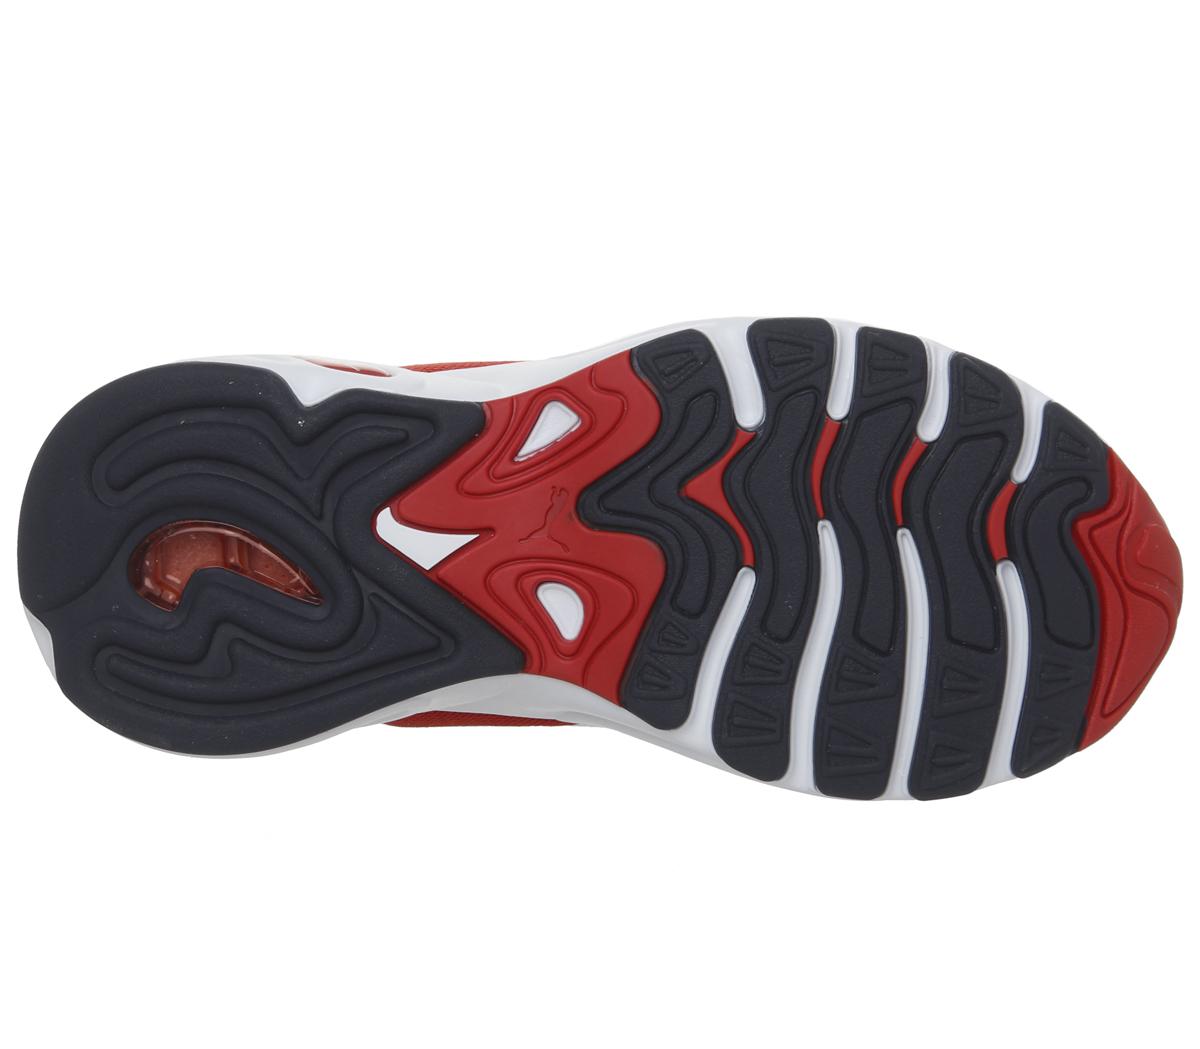 Homme-Puma-Cell-Viper-Baskets-PUMA-blanc-Risque-Eleve-Rouge-Baskets miniature 10